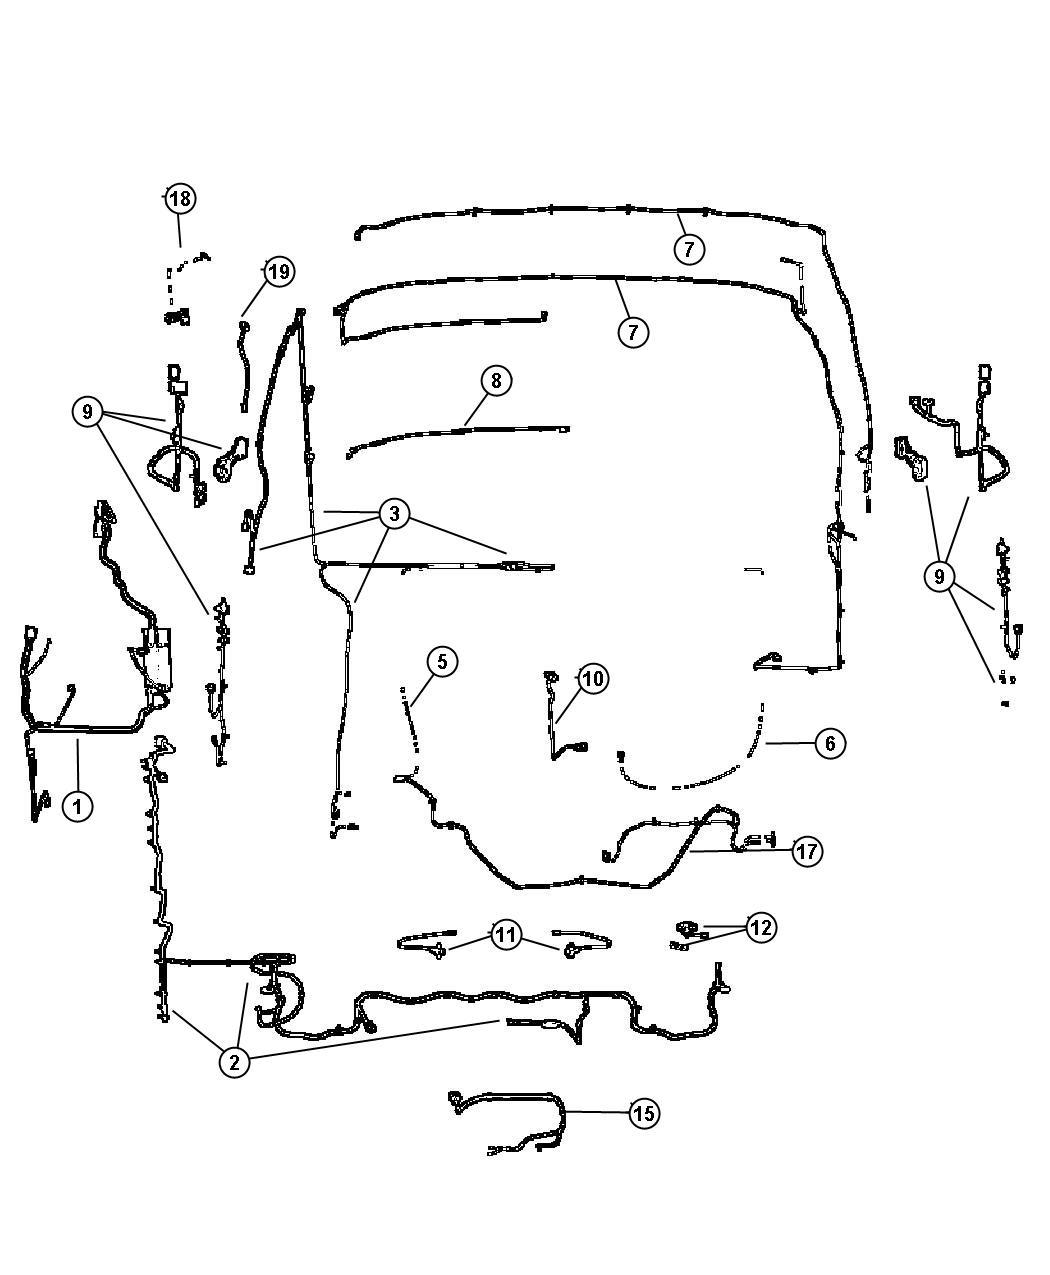 Jeep Cherokee Adapter Converts 7 Way Round To 4 Way